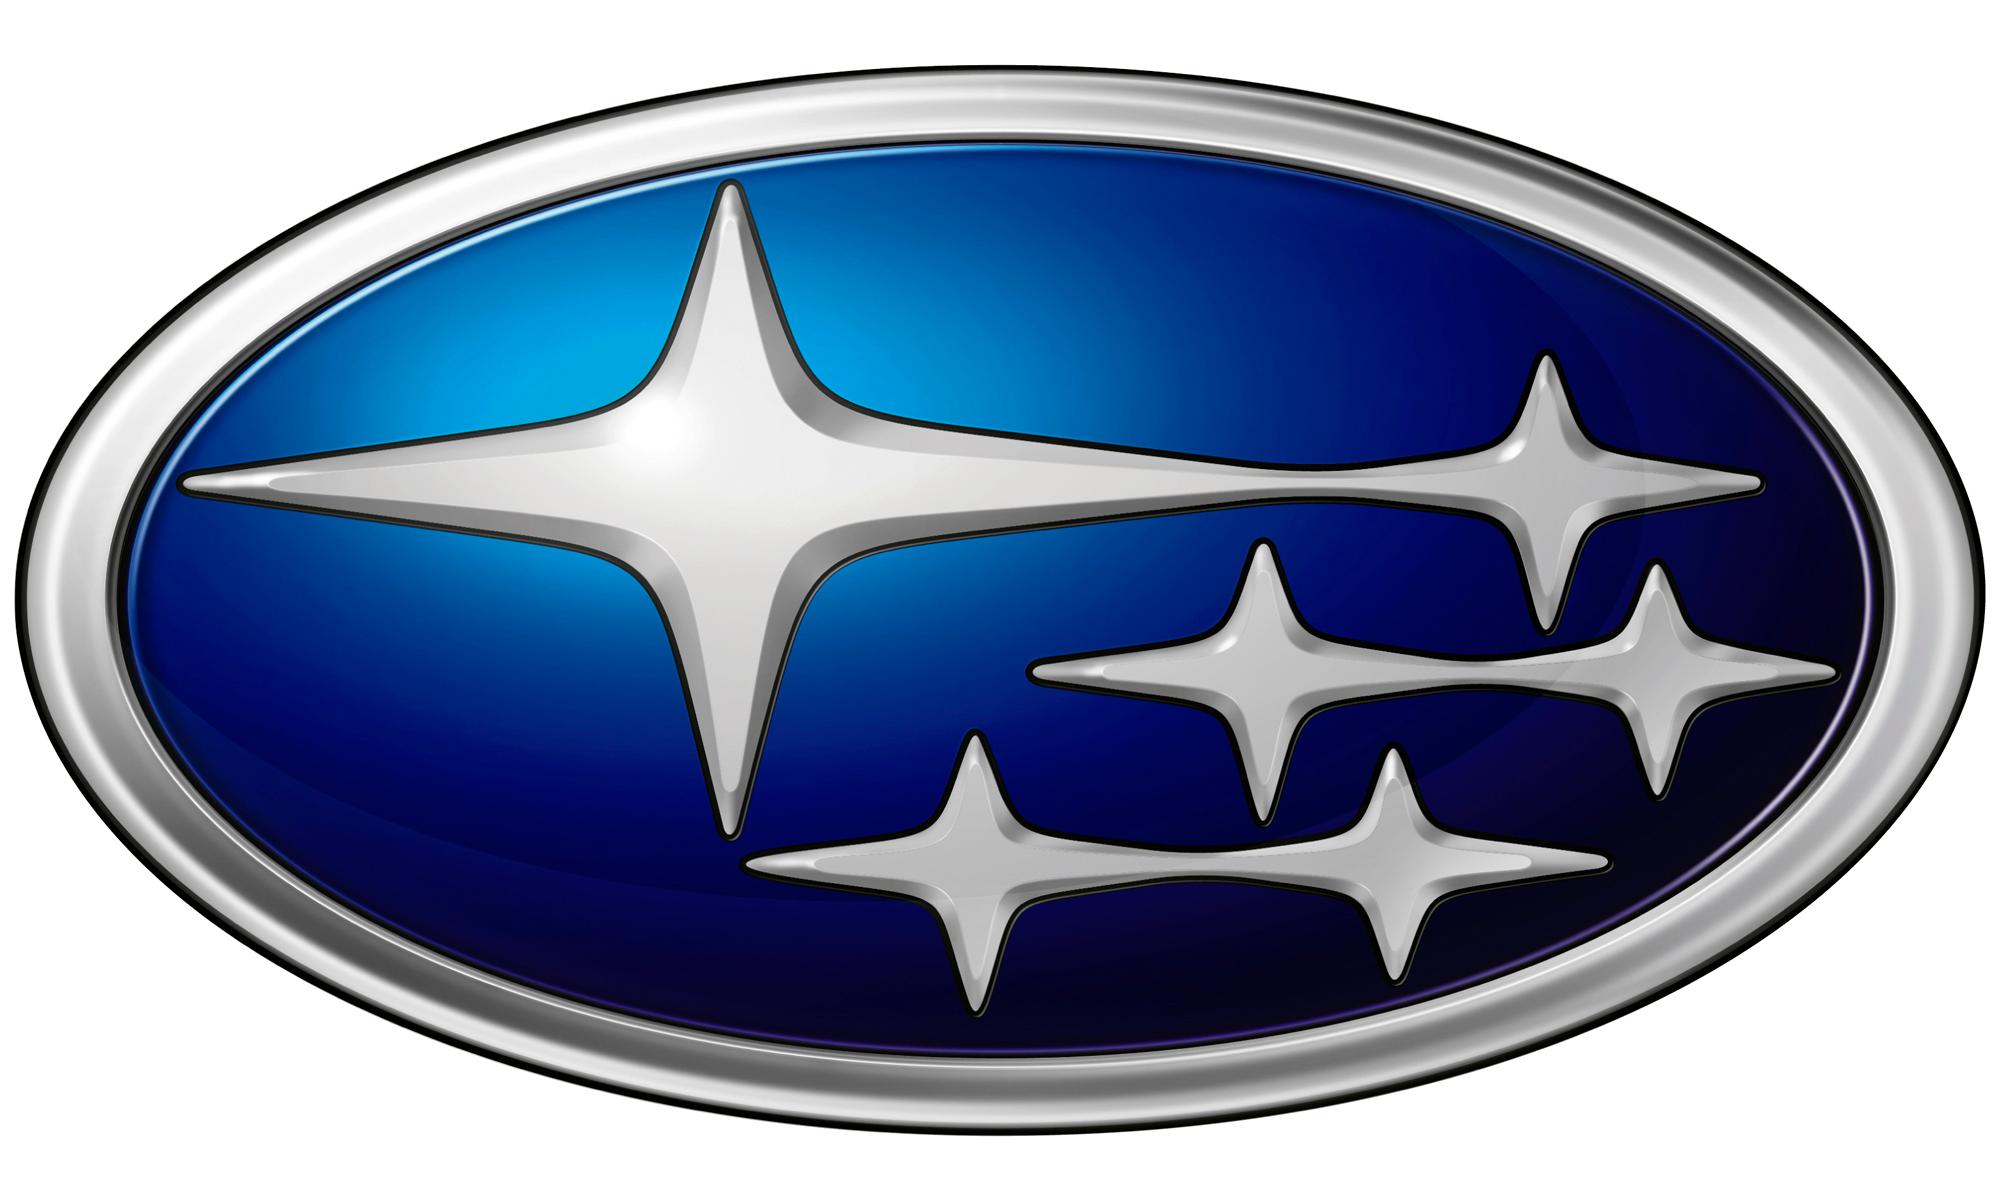 Subaru Car Logo Png Brand Image - Car, Transparent background PNG HD thumbnail